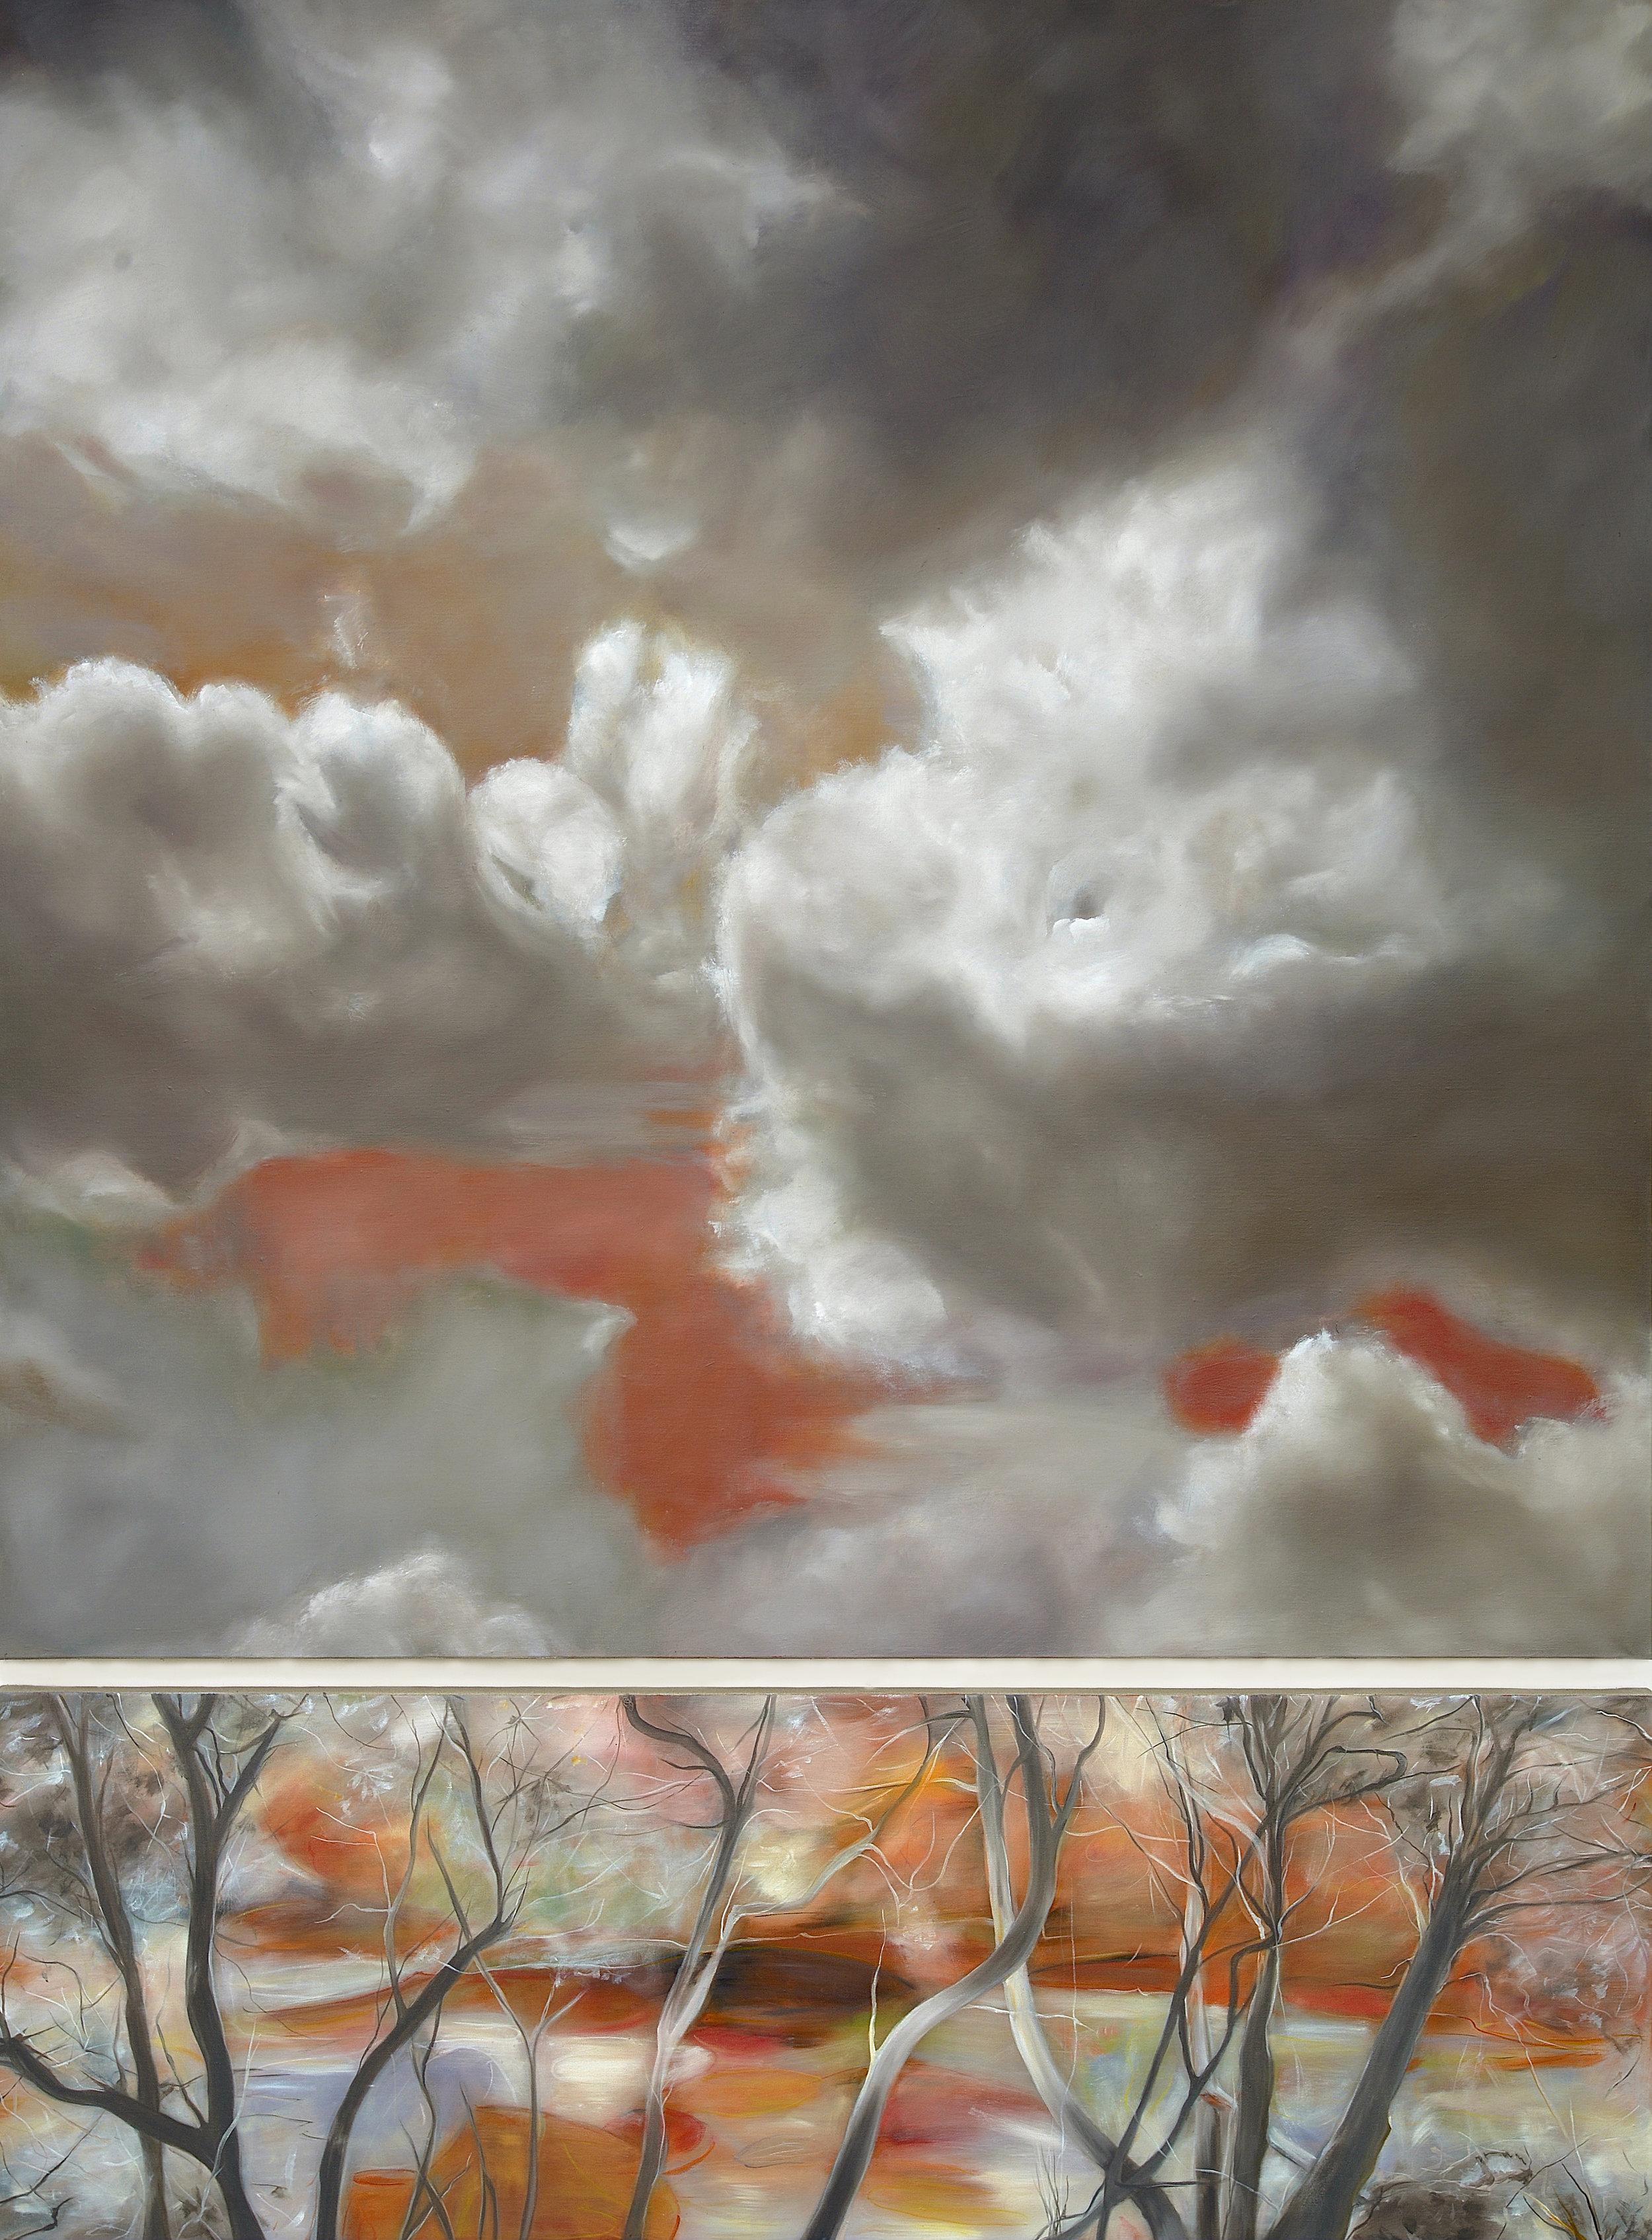 Invitation au Voyage,  2016  oil on linen, diptych, 84 x 63 in, 213 x 160 cm